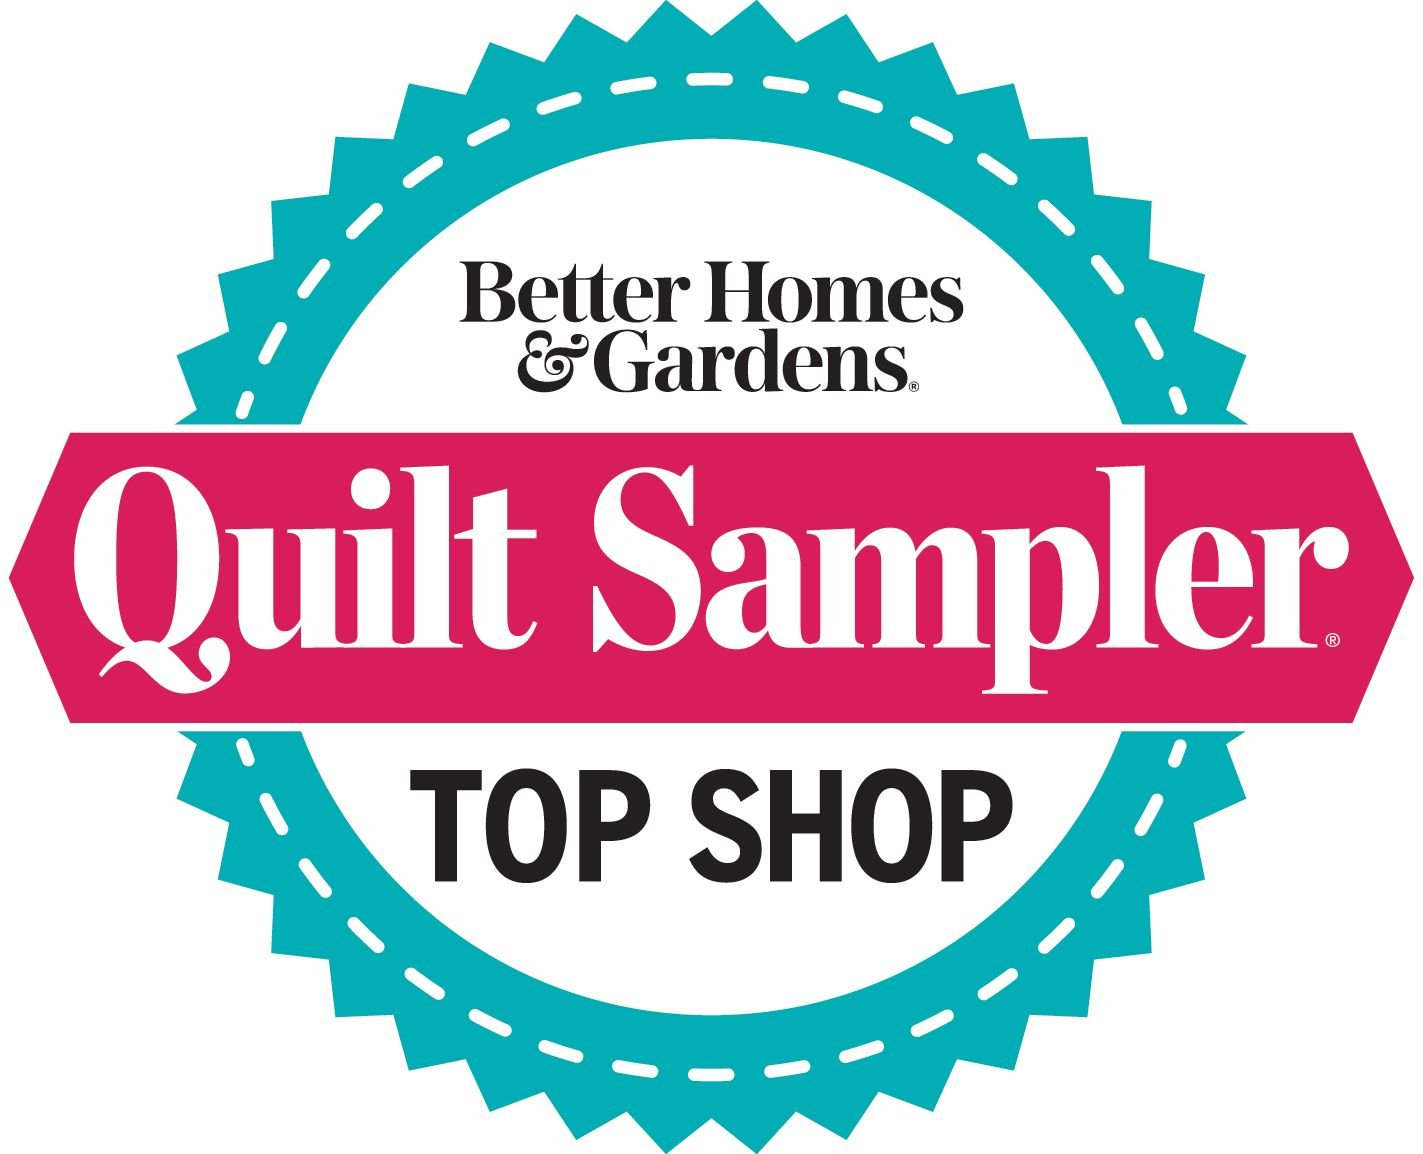 Quilt Sampler Fall/Winter 2021